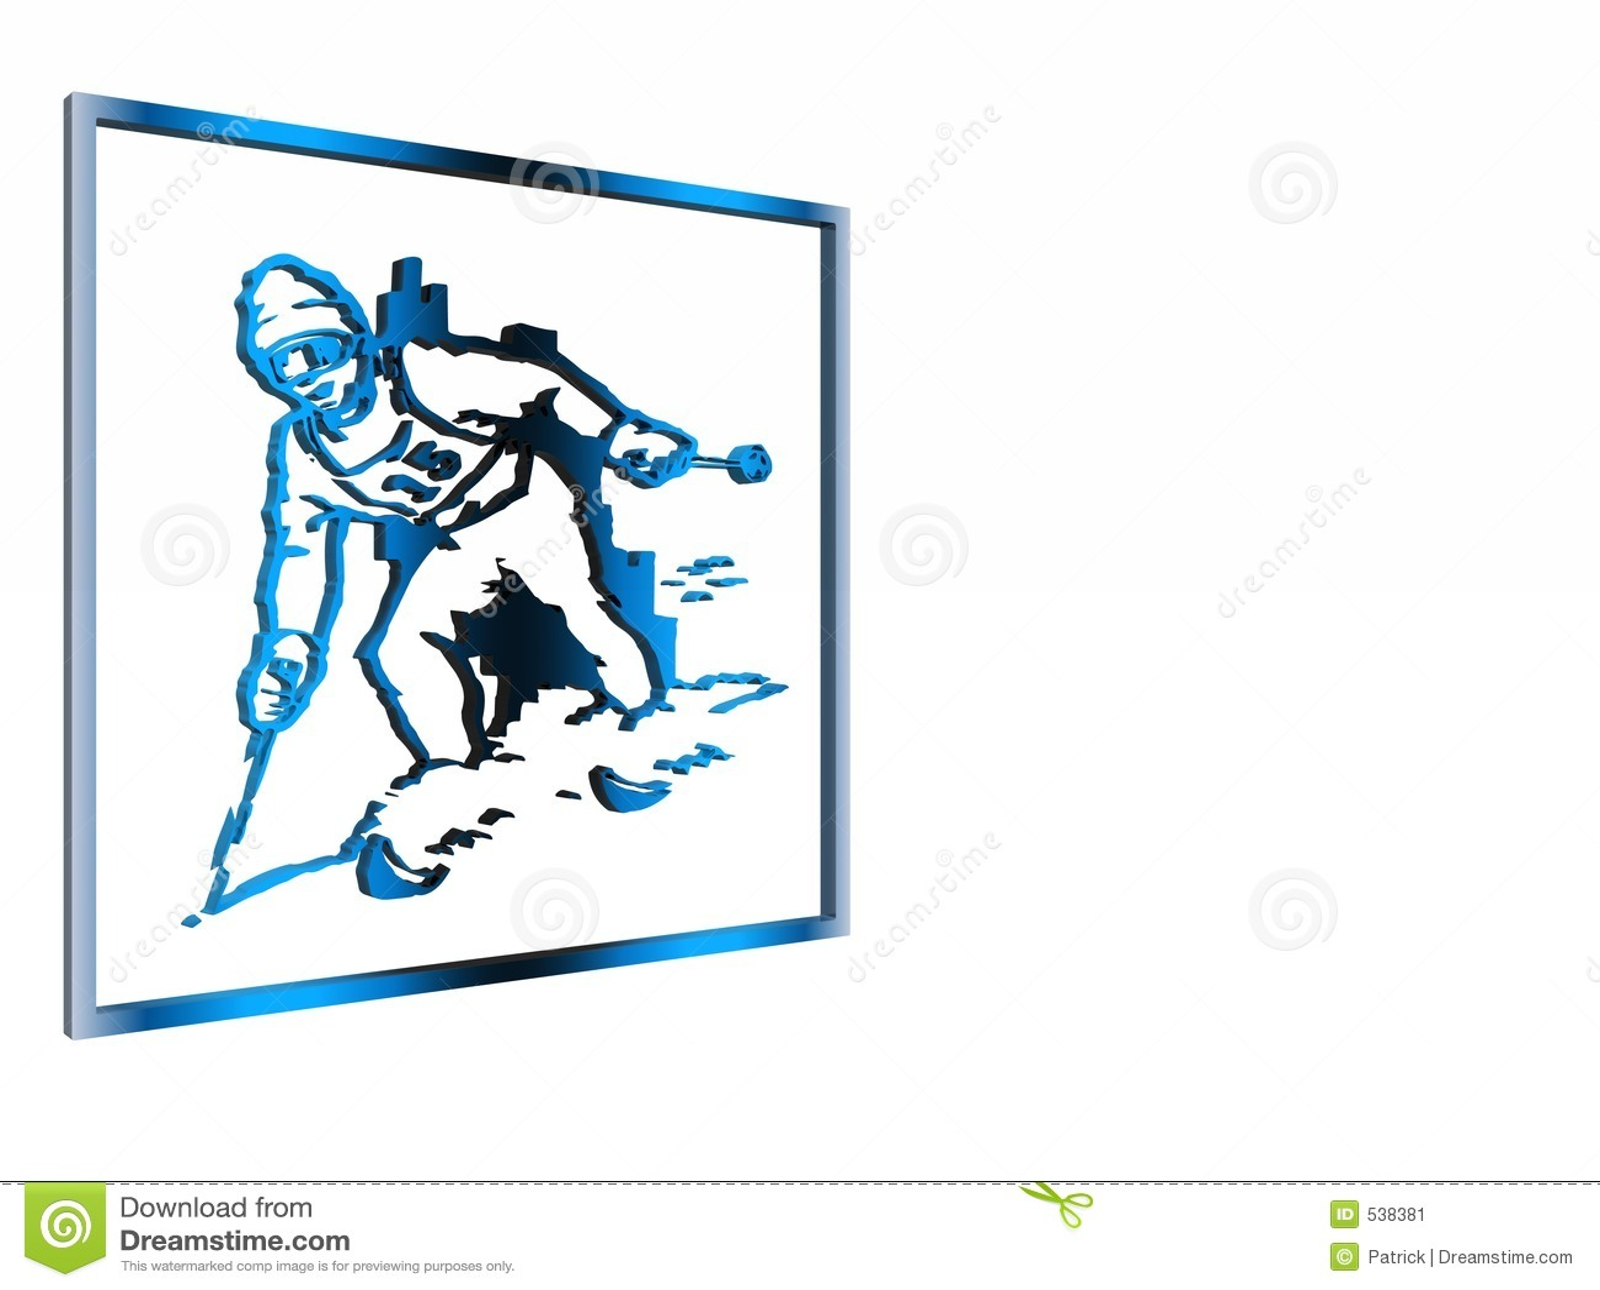 Download 预警地区符号滑雪symbo 库存例证. 插画 包括有 正方形, 路径, 剪报, 空间, 体操运动员, 设计, 小心 - 538381